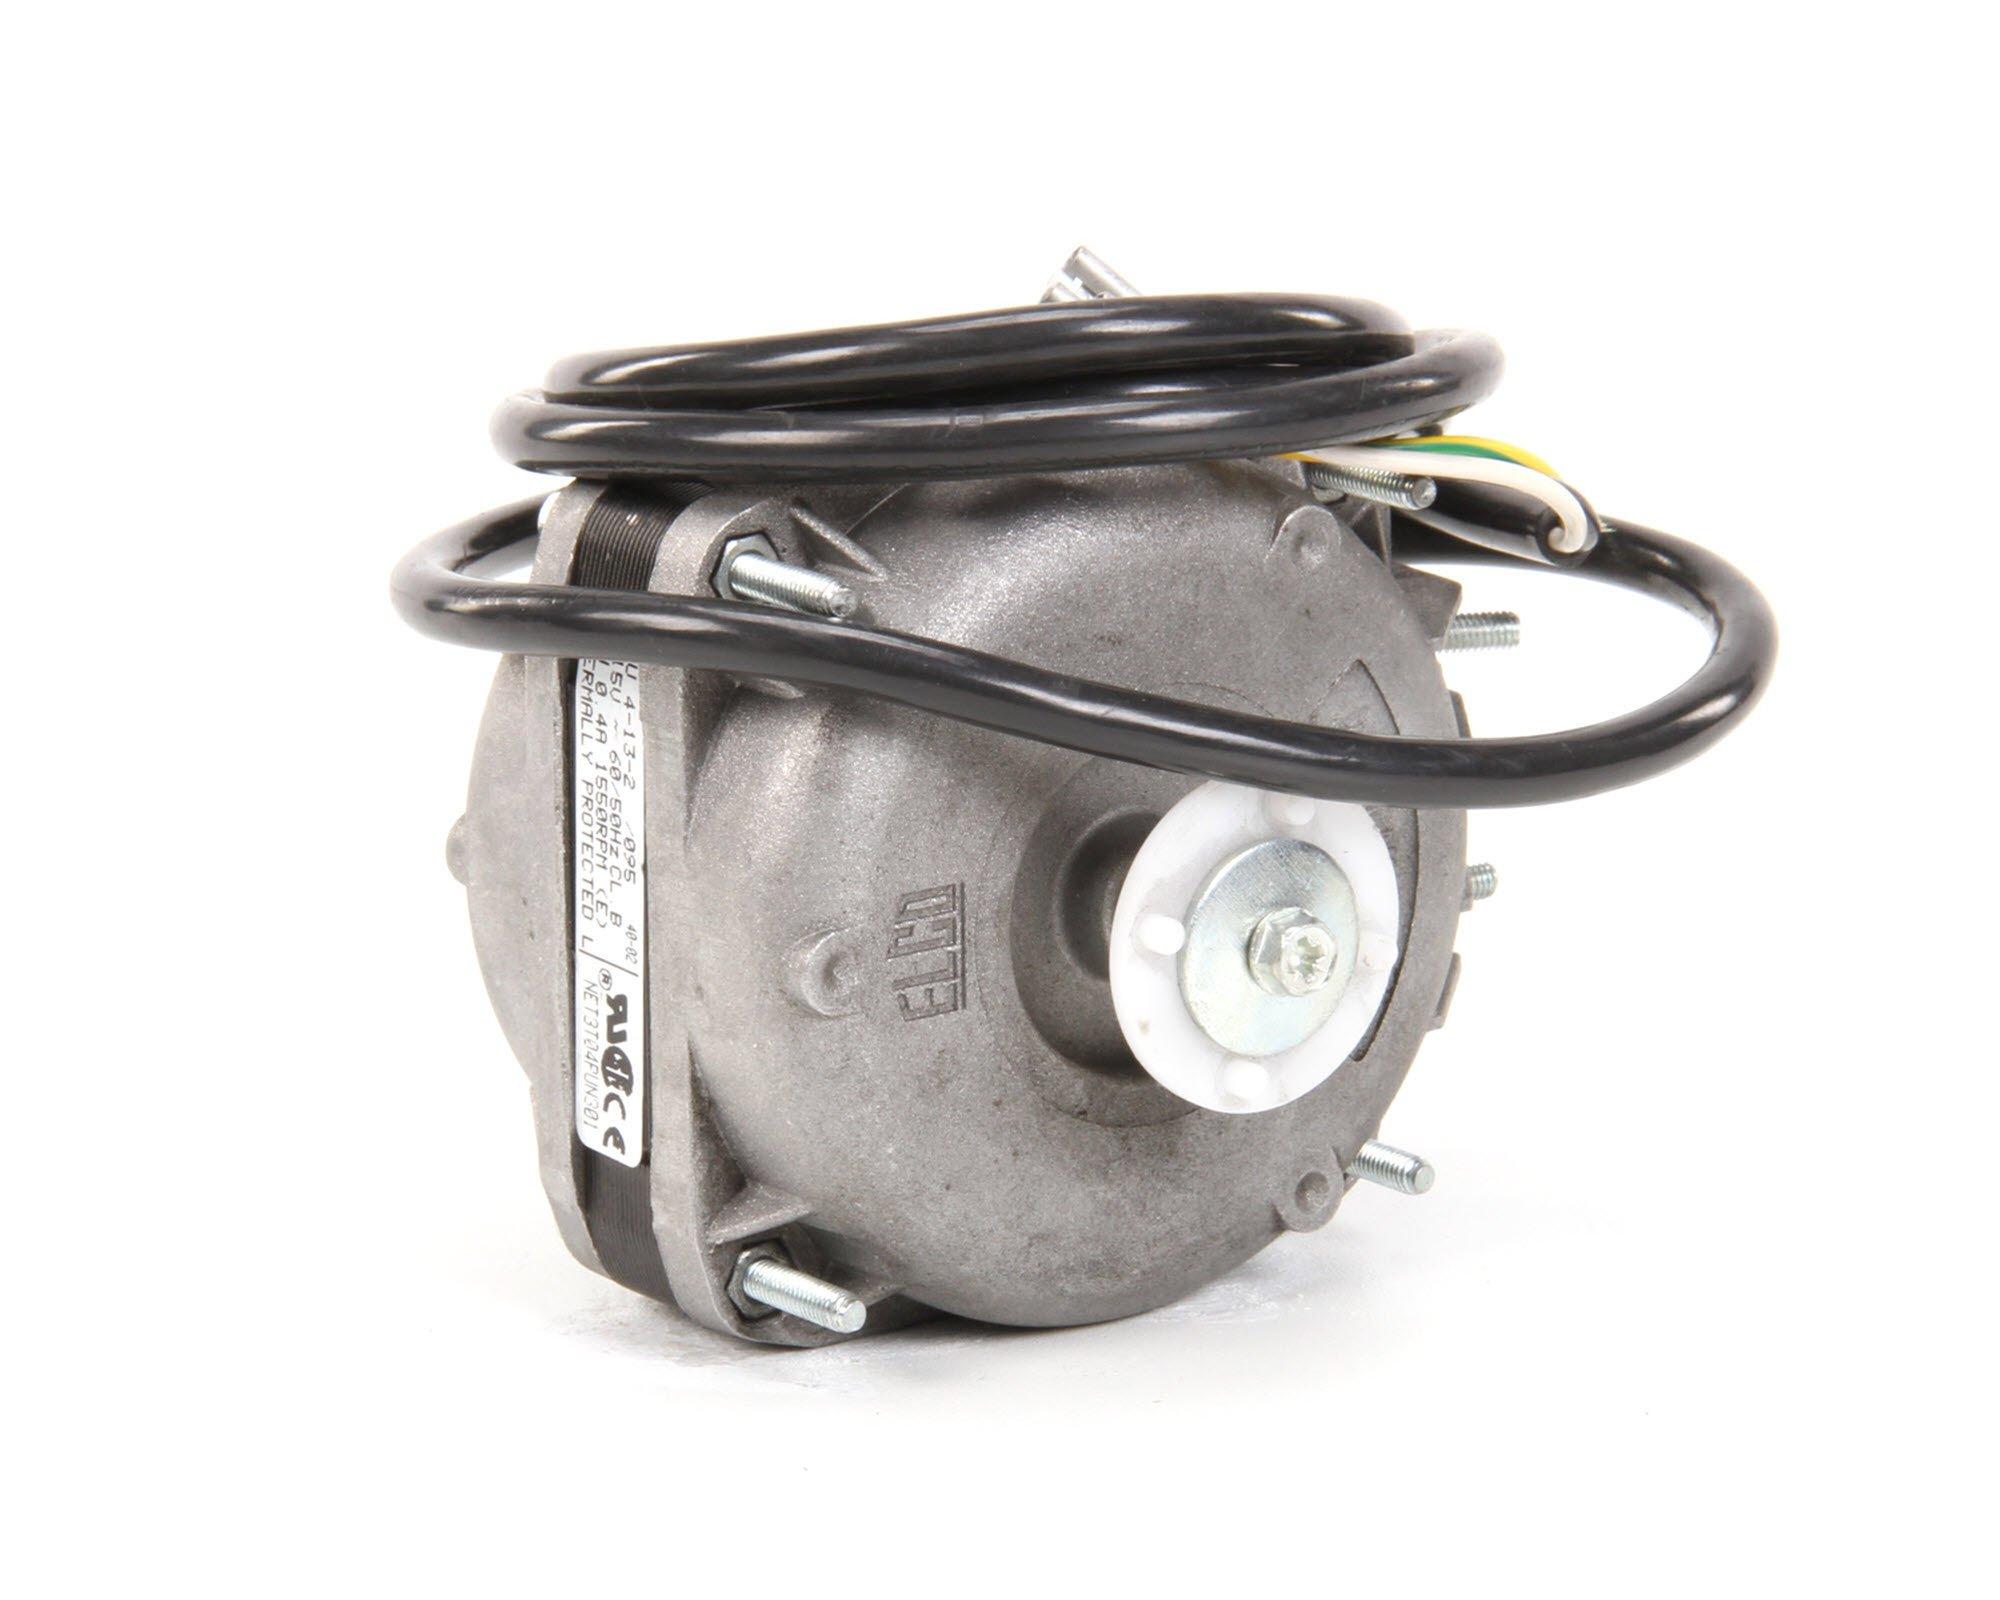 Desmon Usa R35-0035-25955 Condenser Fan Motor